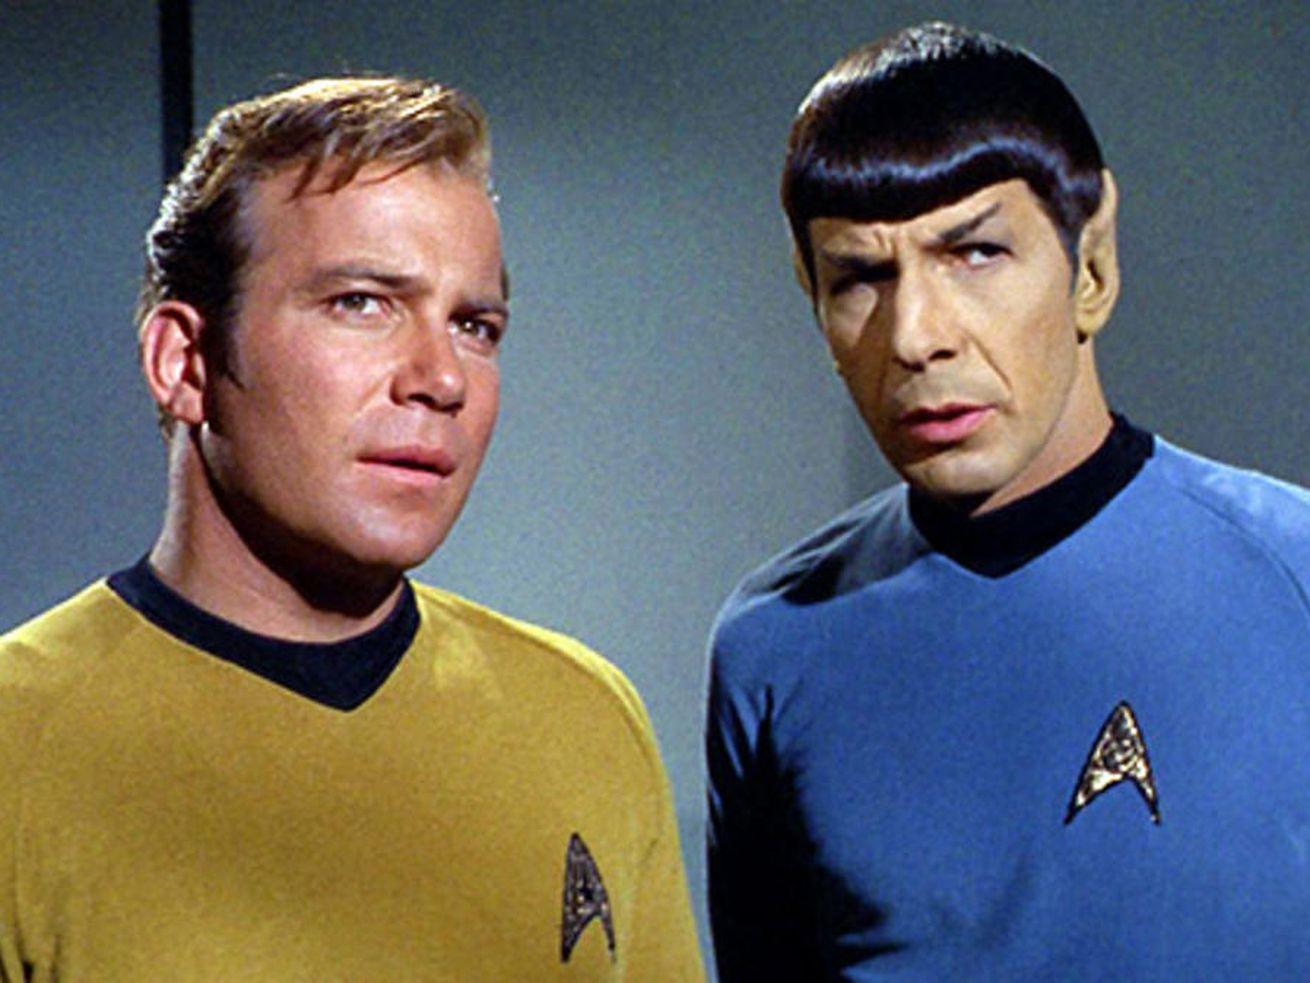 Your Weekend: The original 'Star Trek' cast returns to the big screen